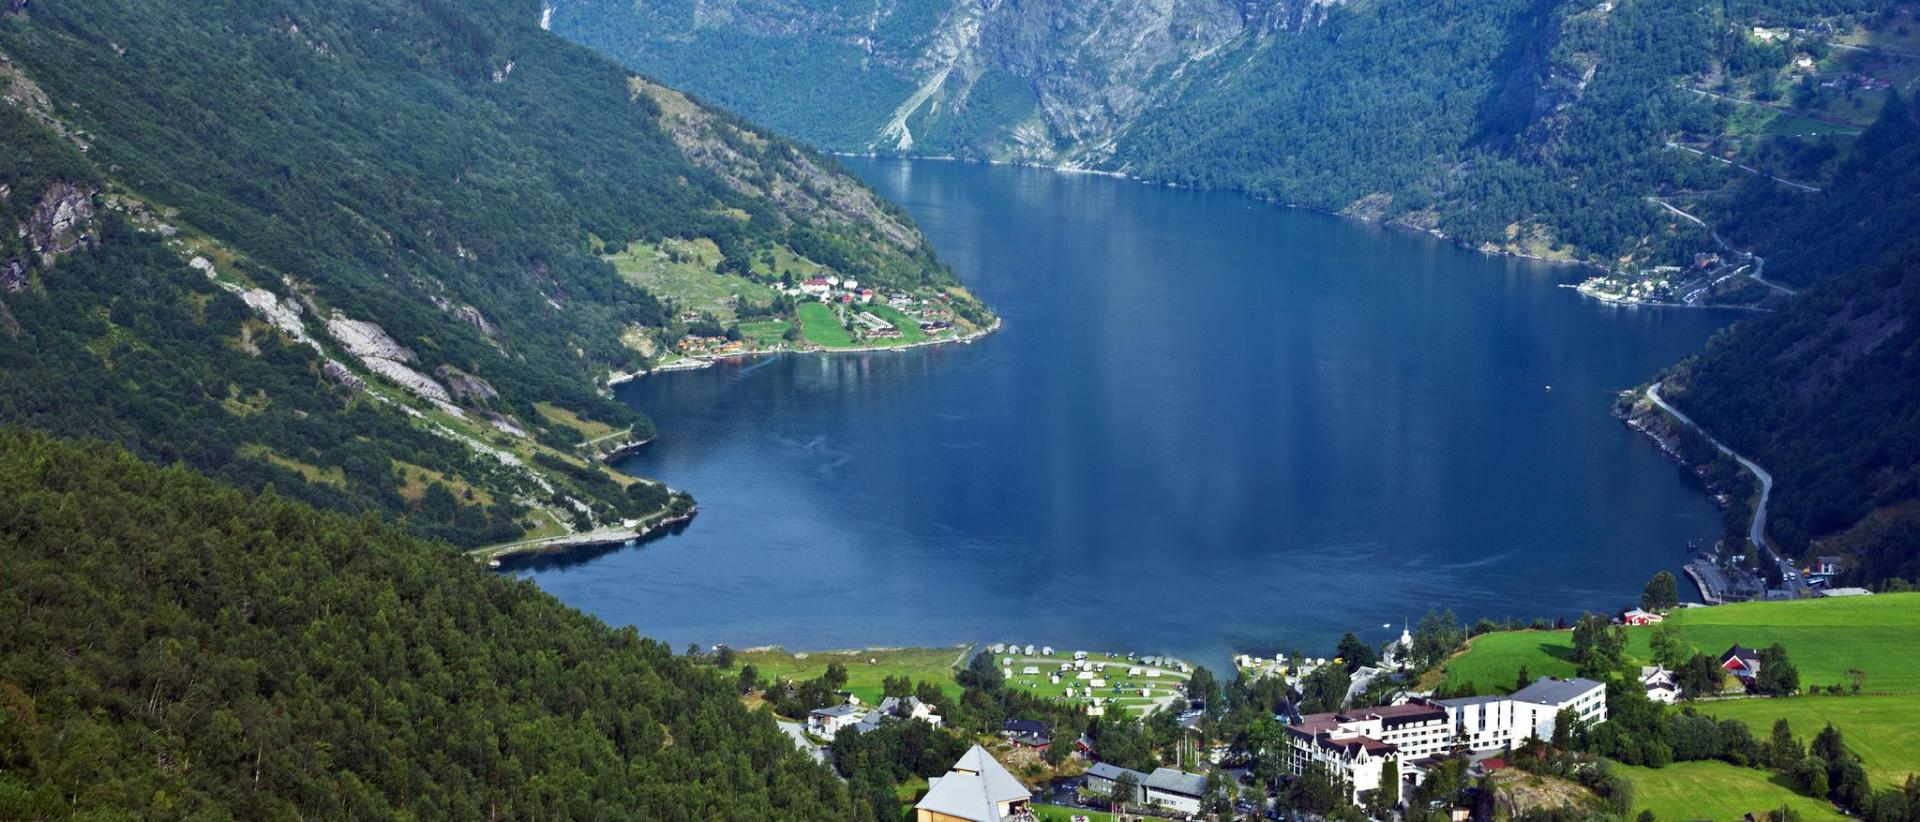 Hotels Near Grande Fjord Hotel Geiranger Best Hotel Rates